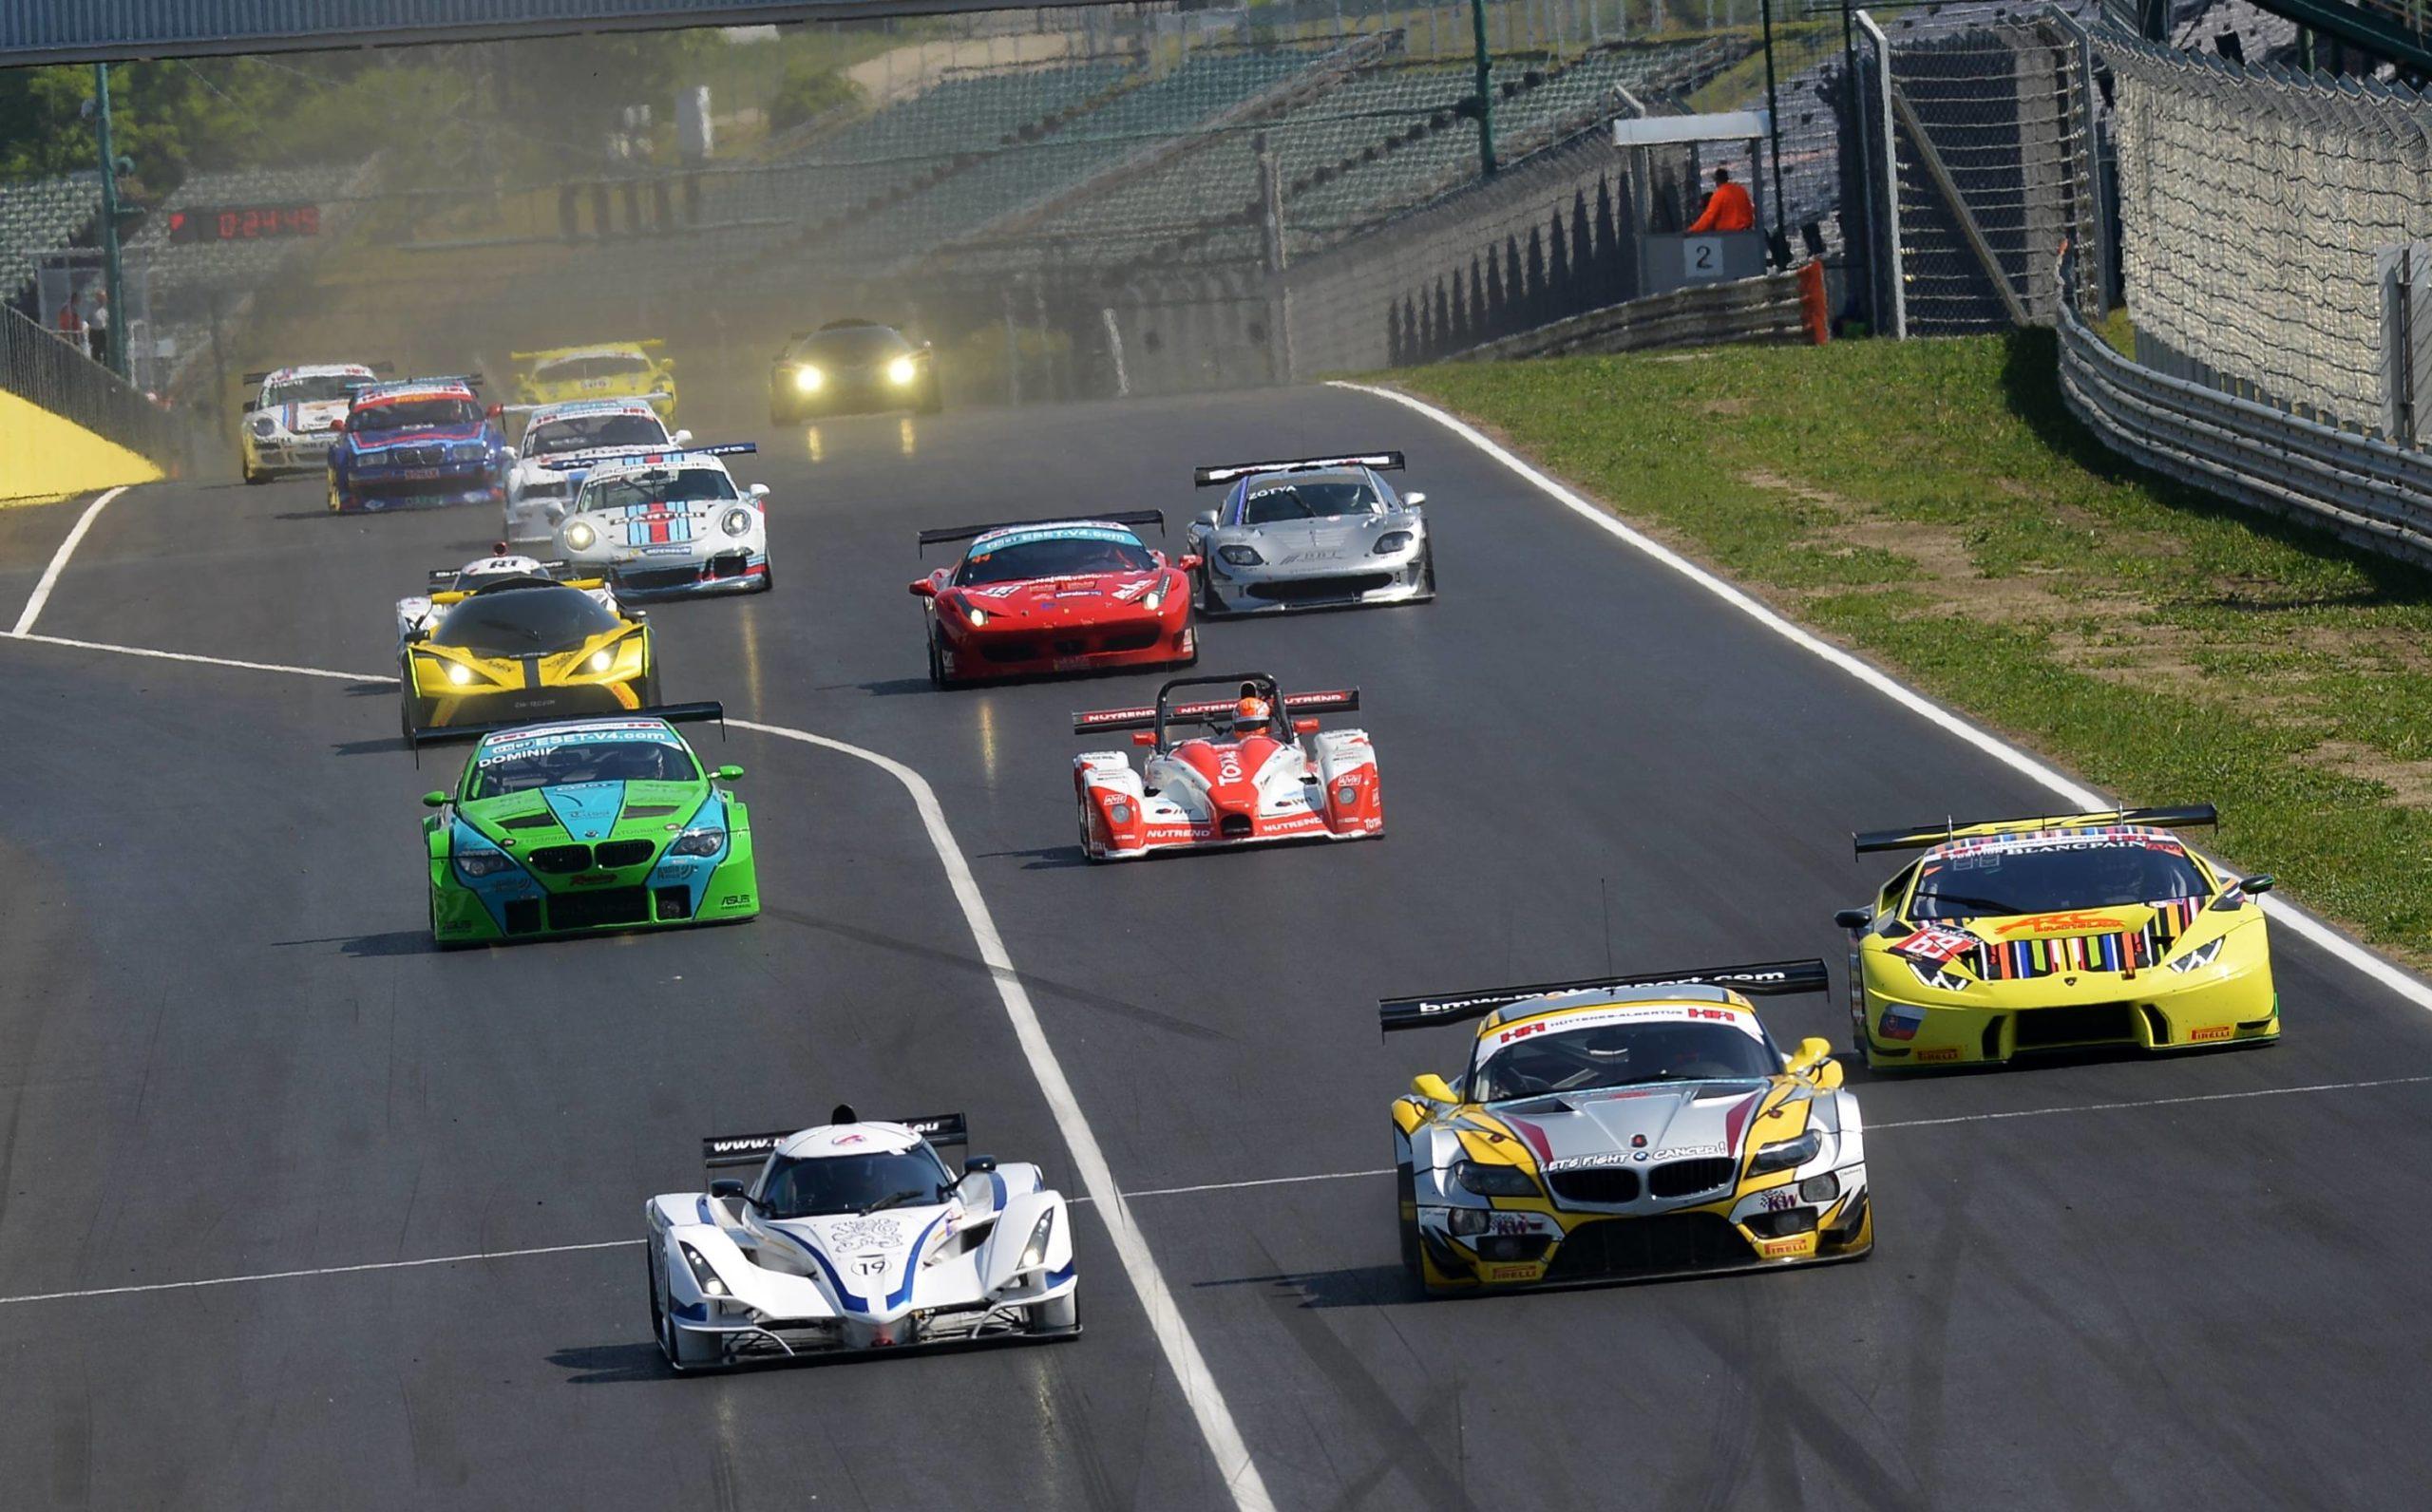 Beginning of the season at Hungaroring